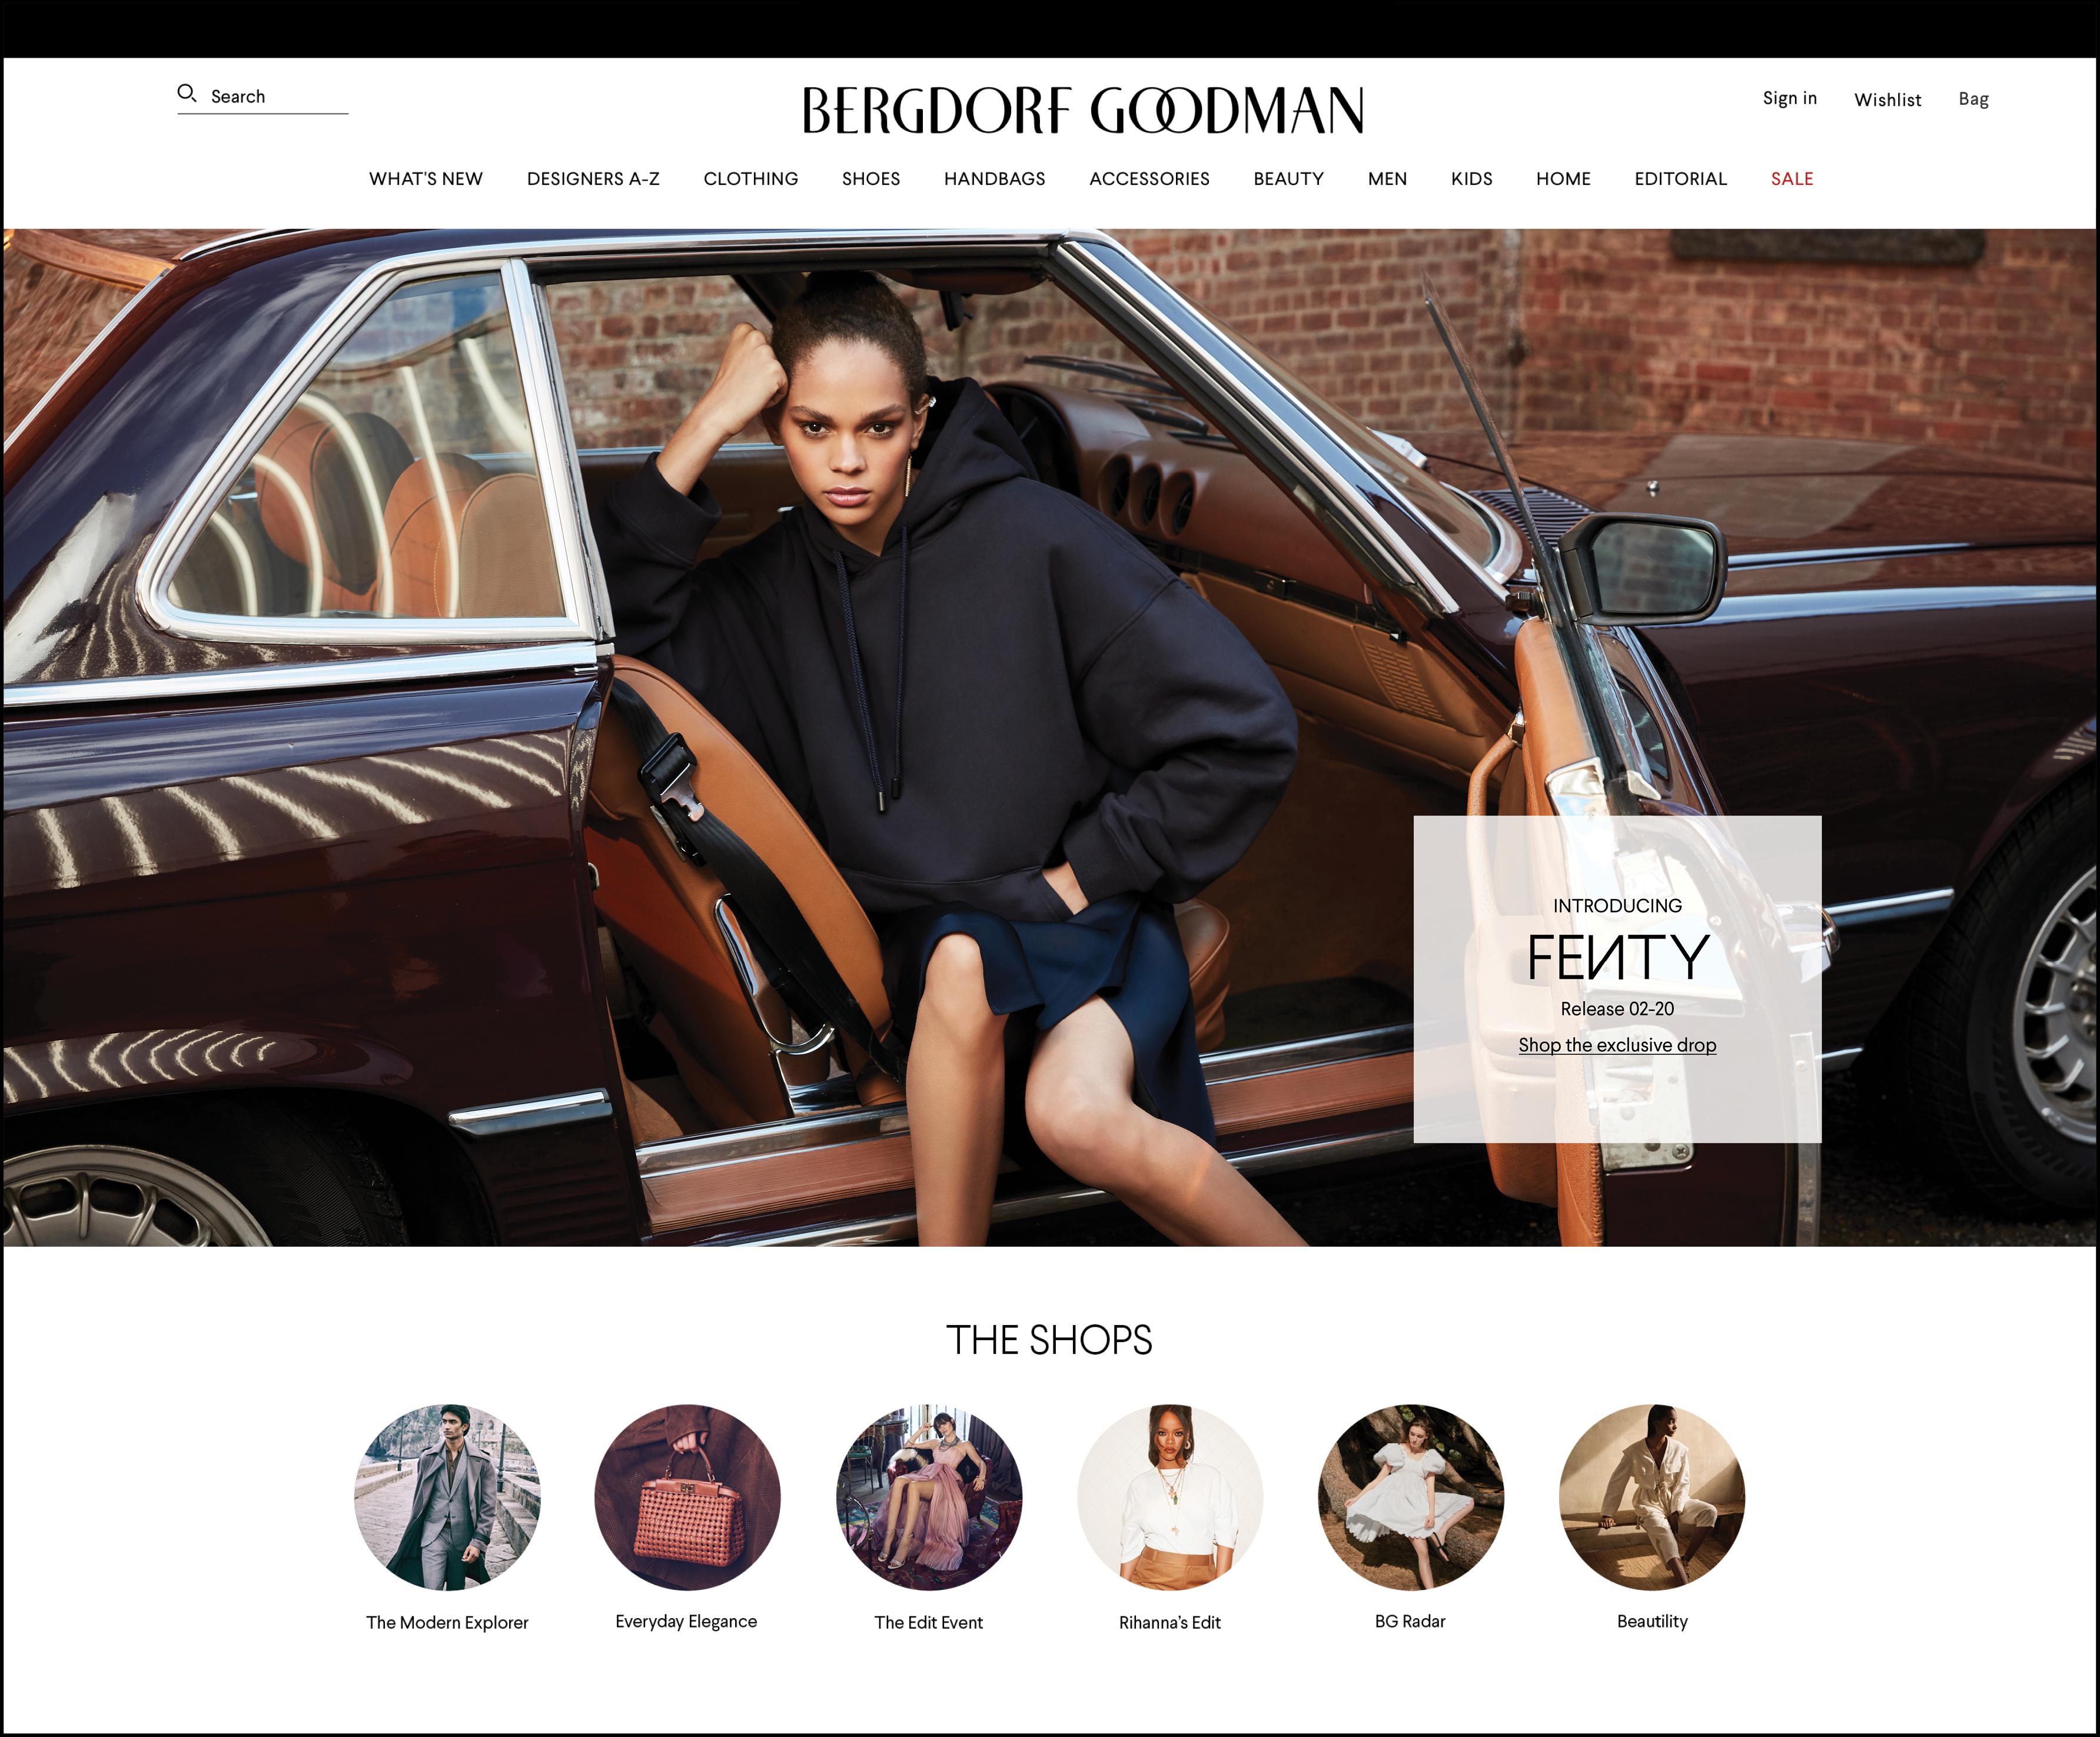 The new bg.com homepage featuring Fenty.